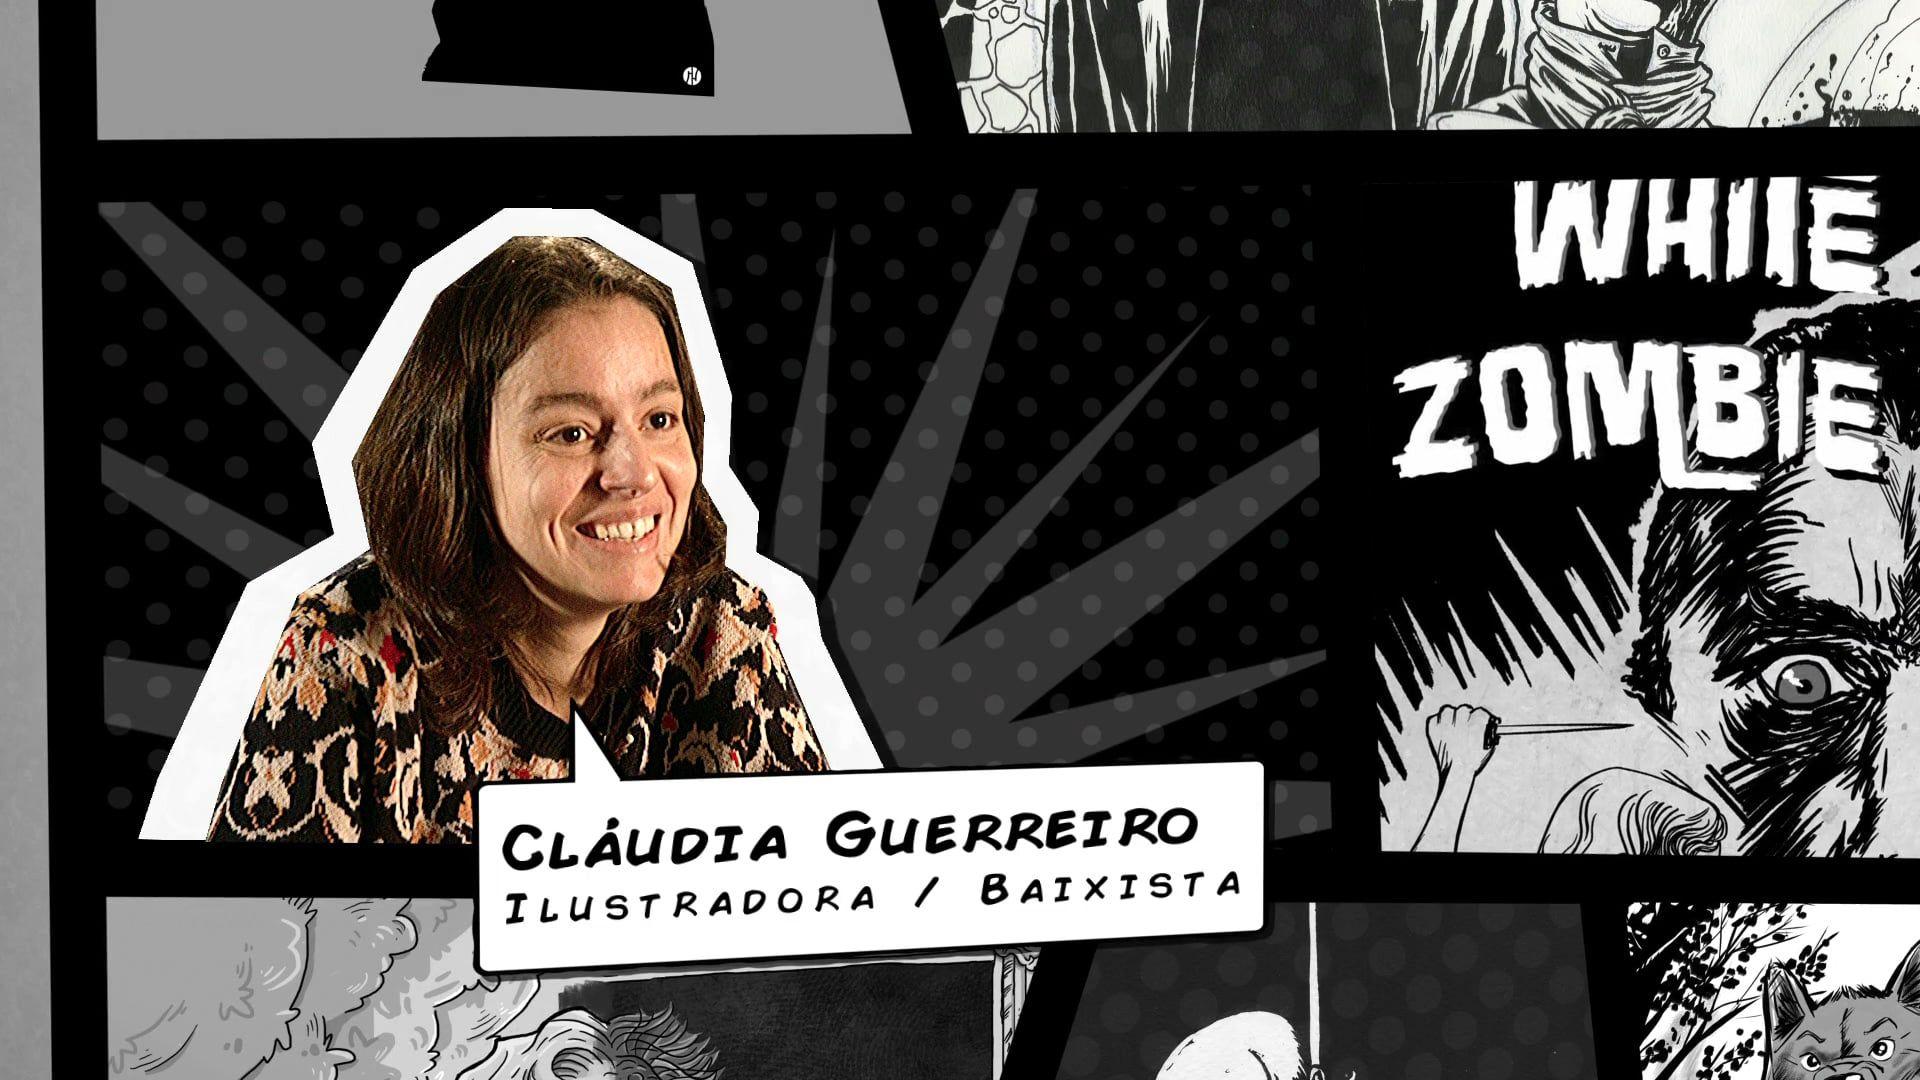 CLÁUDIA GUERREIRO - FIGURAS CLÁSSICAS DO TERROR